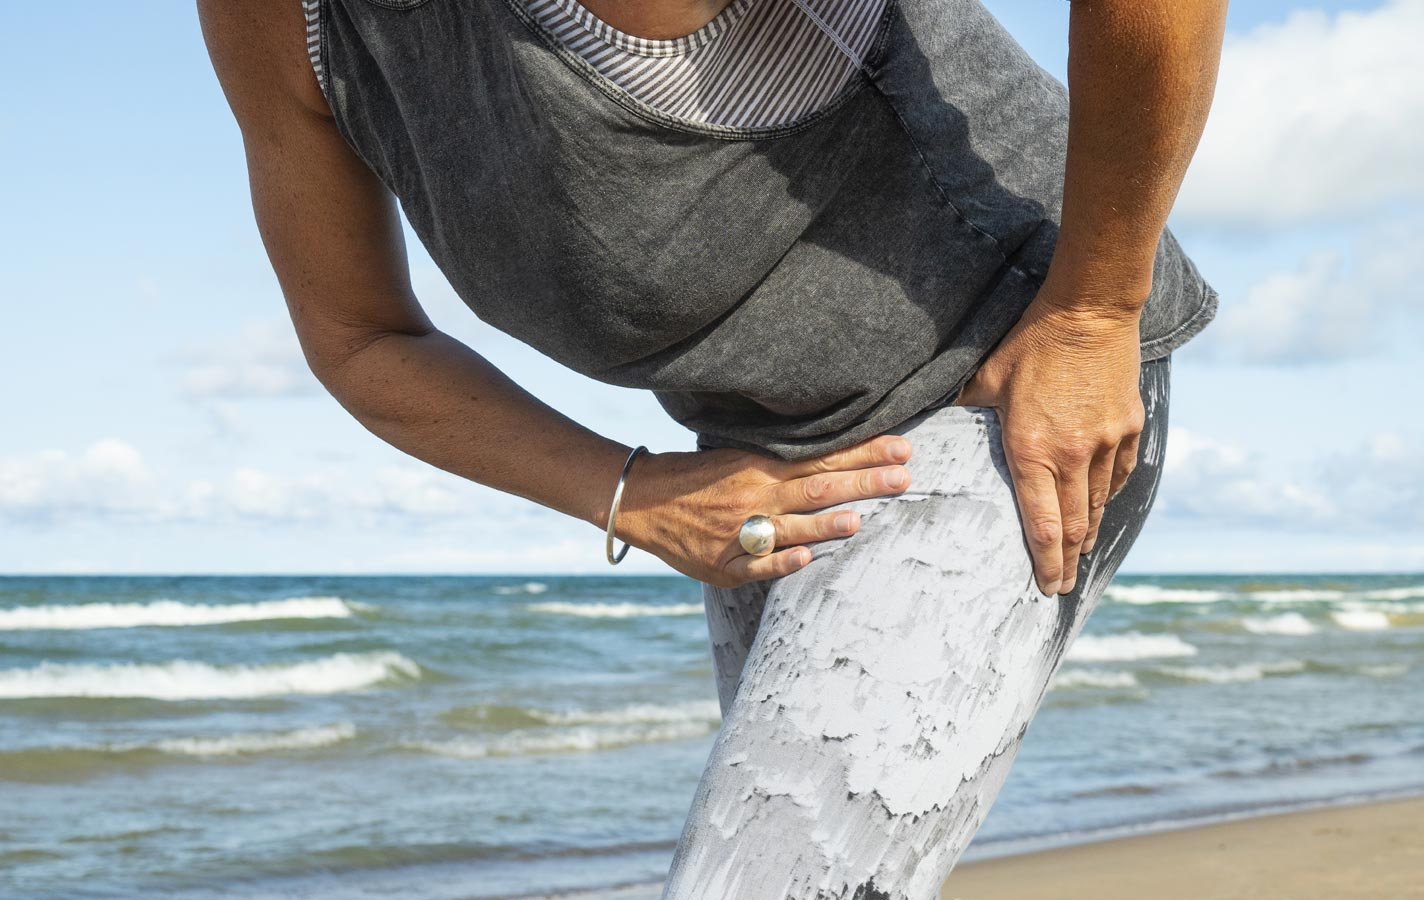 elderly woman on beach holding hip